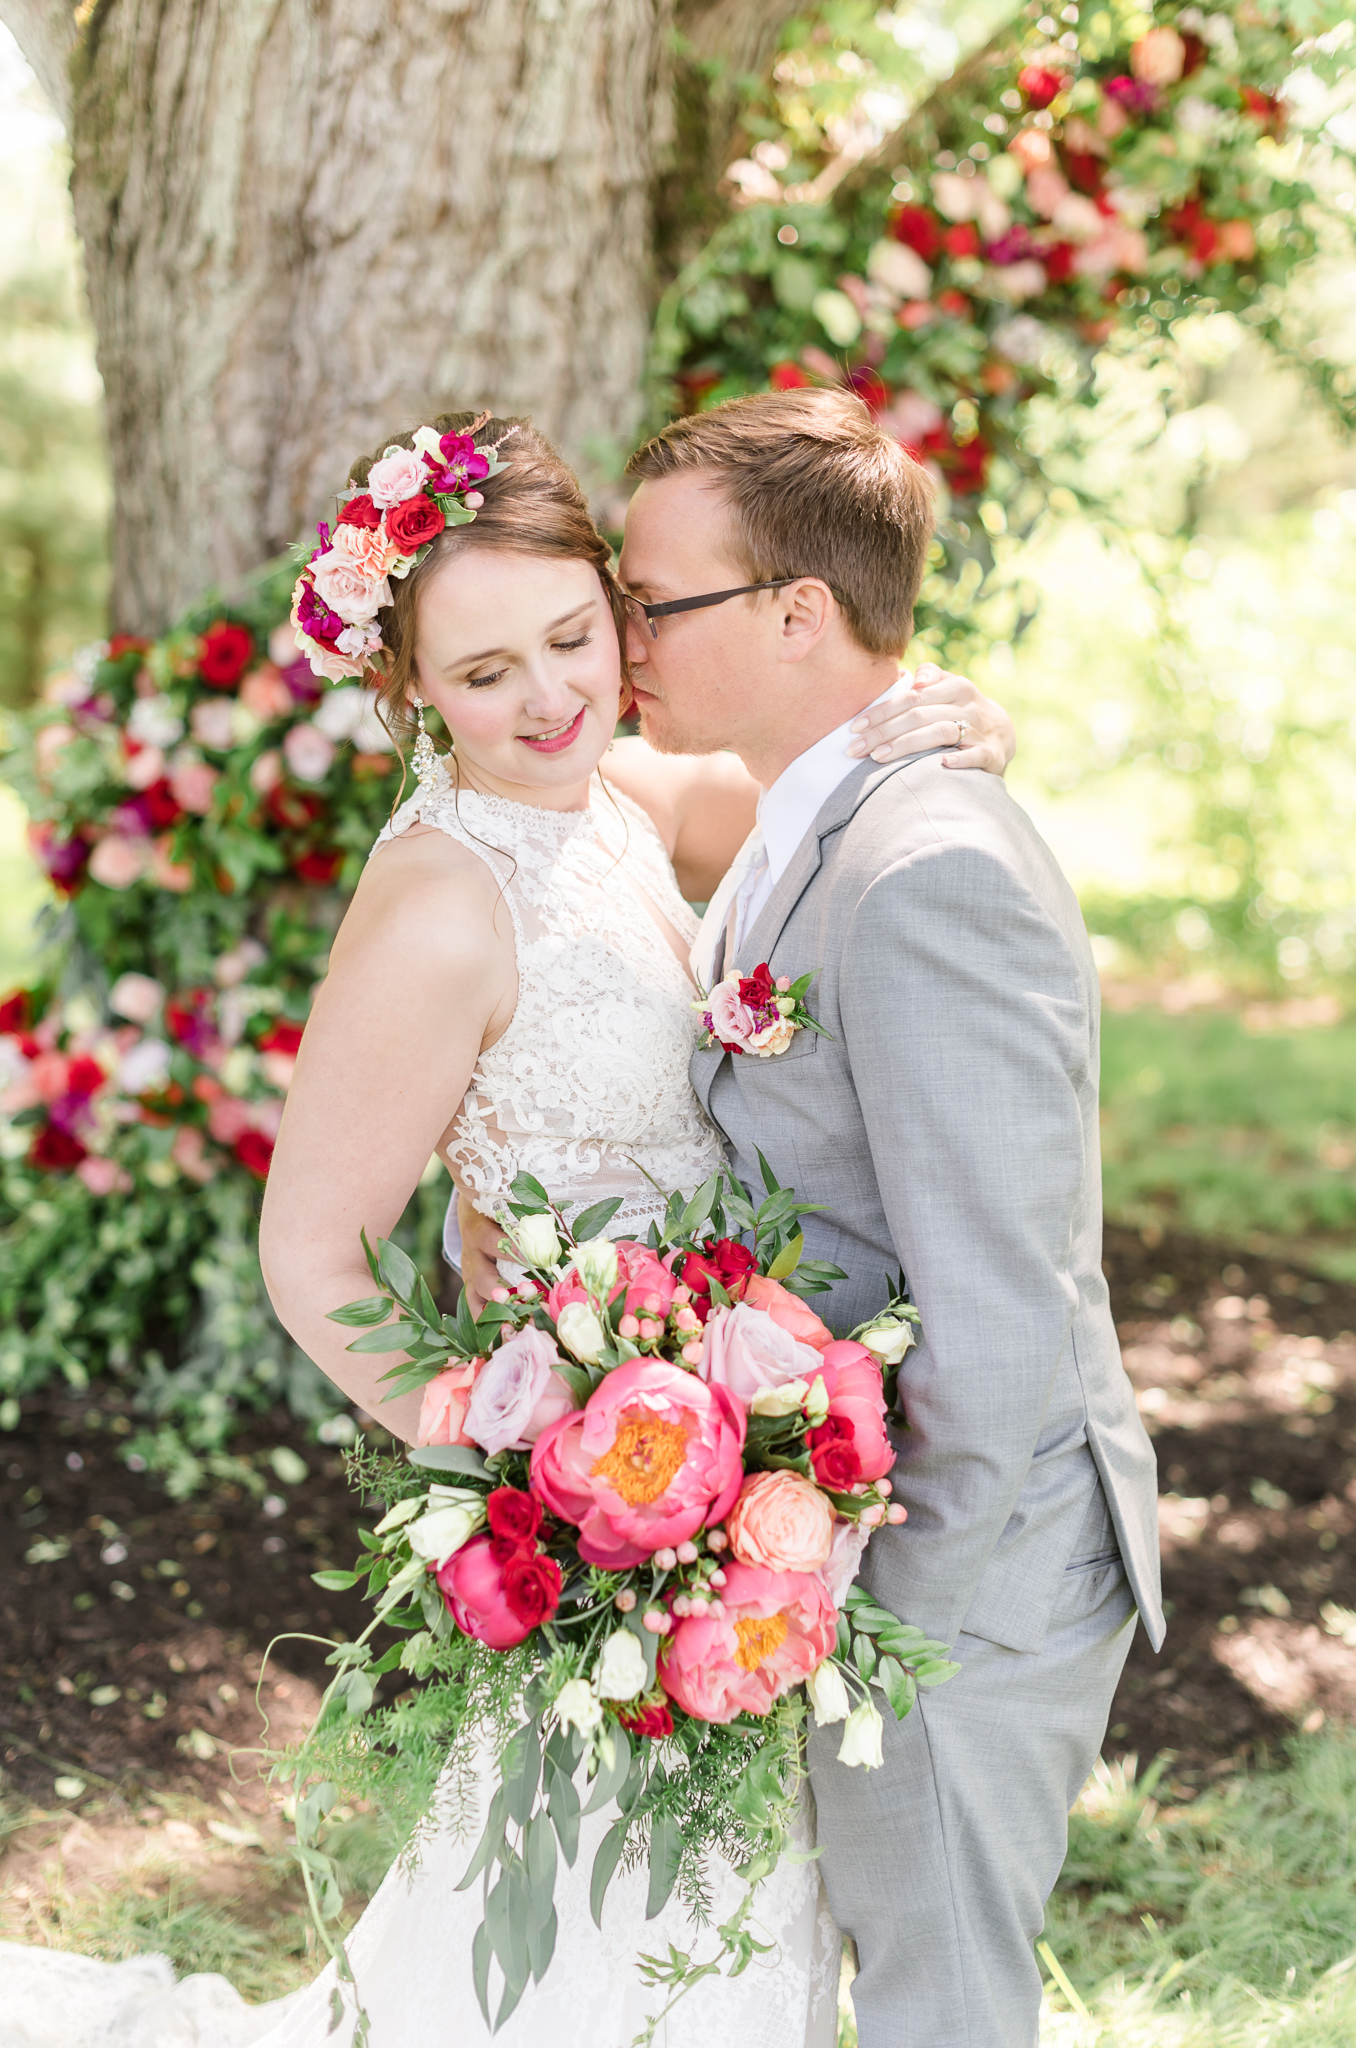 Mustard Seed Gardens Wedding Indianapolis Noblesvile Fishers Wedding Photographer-51.jpg